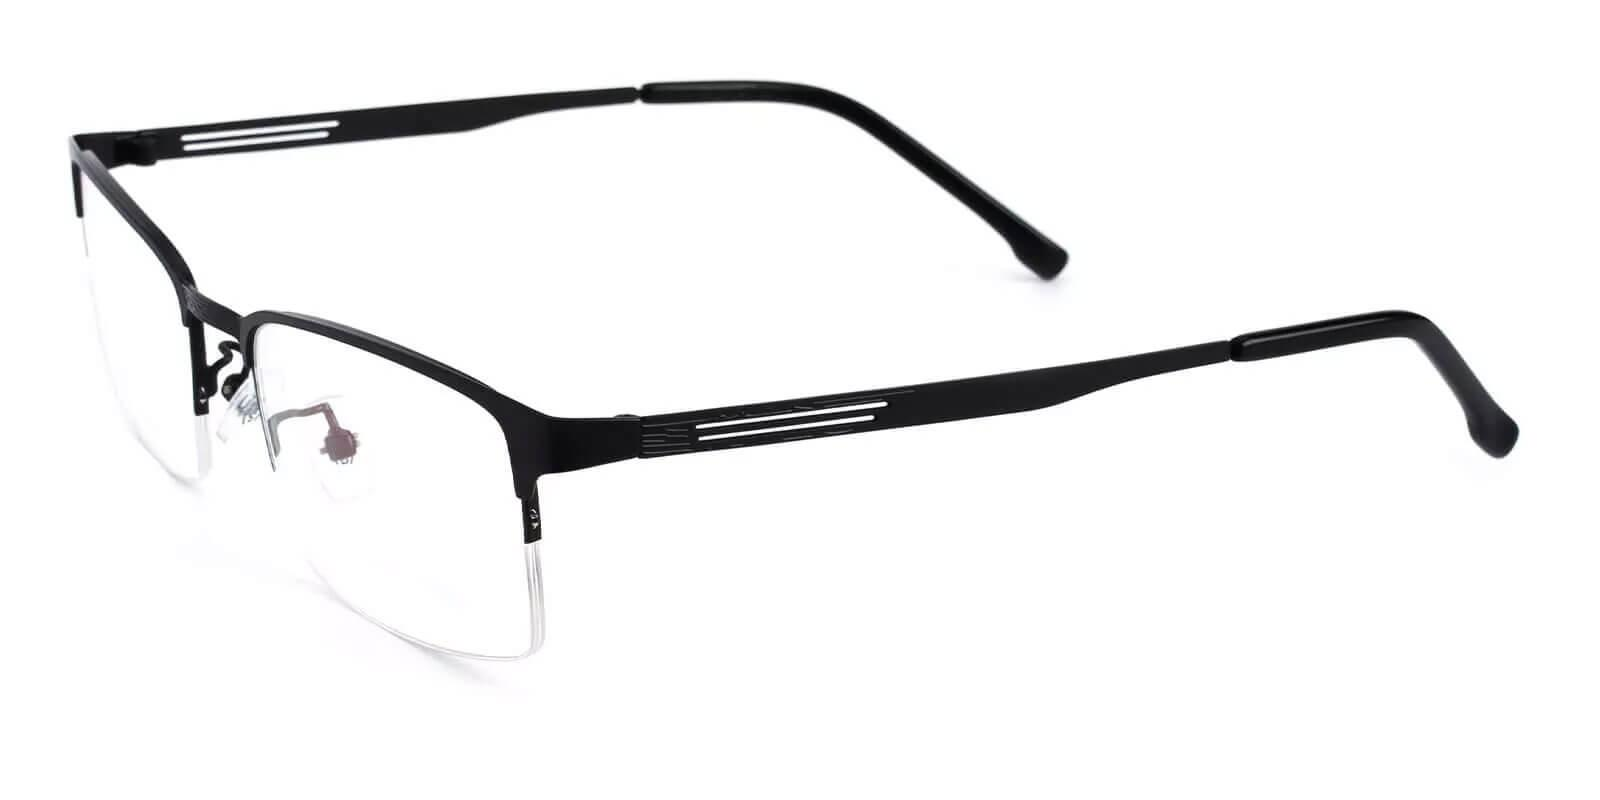 Gabriel Black Metal Eyeglasses , NosePads Frames from ABBE Glasses